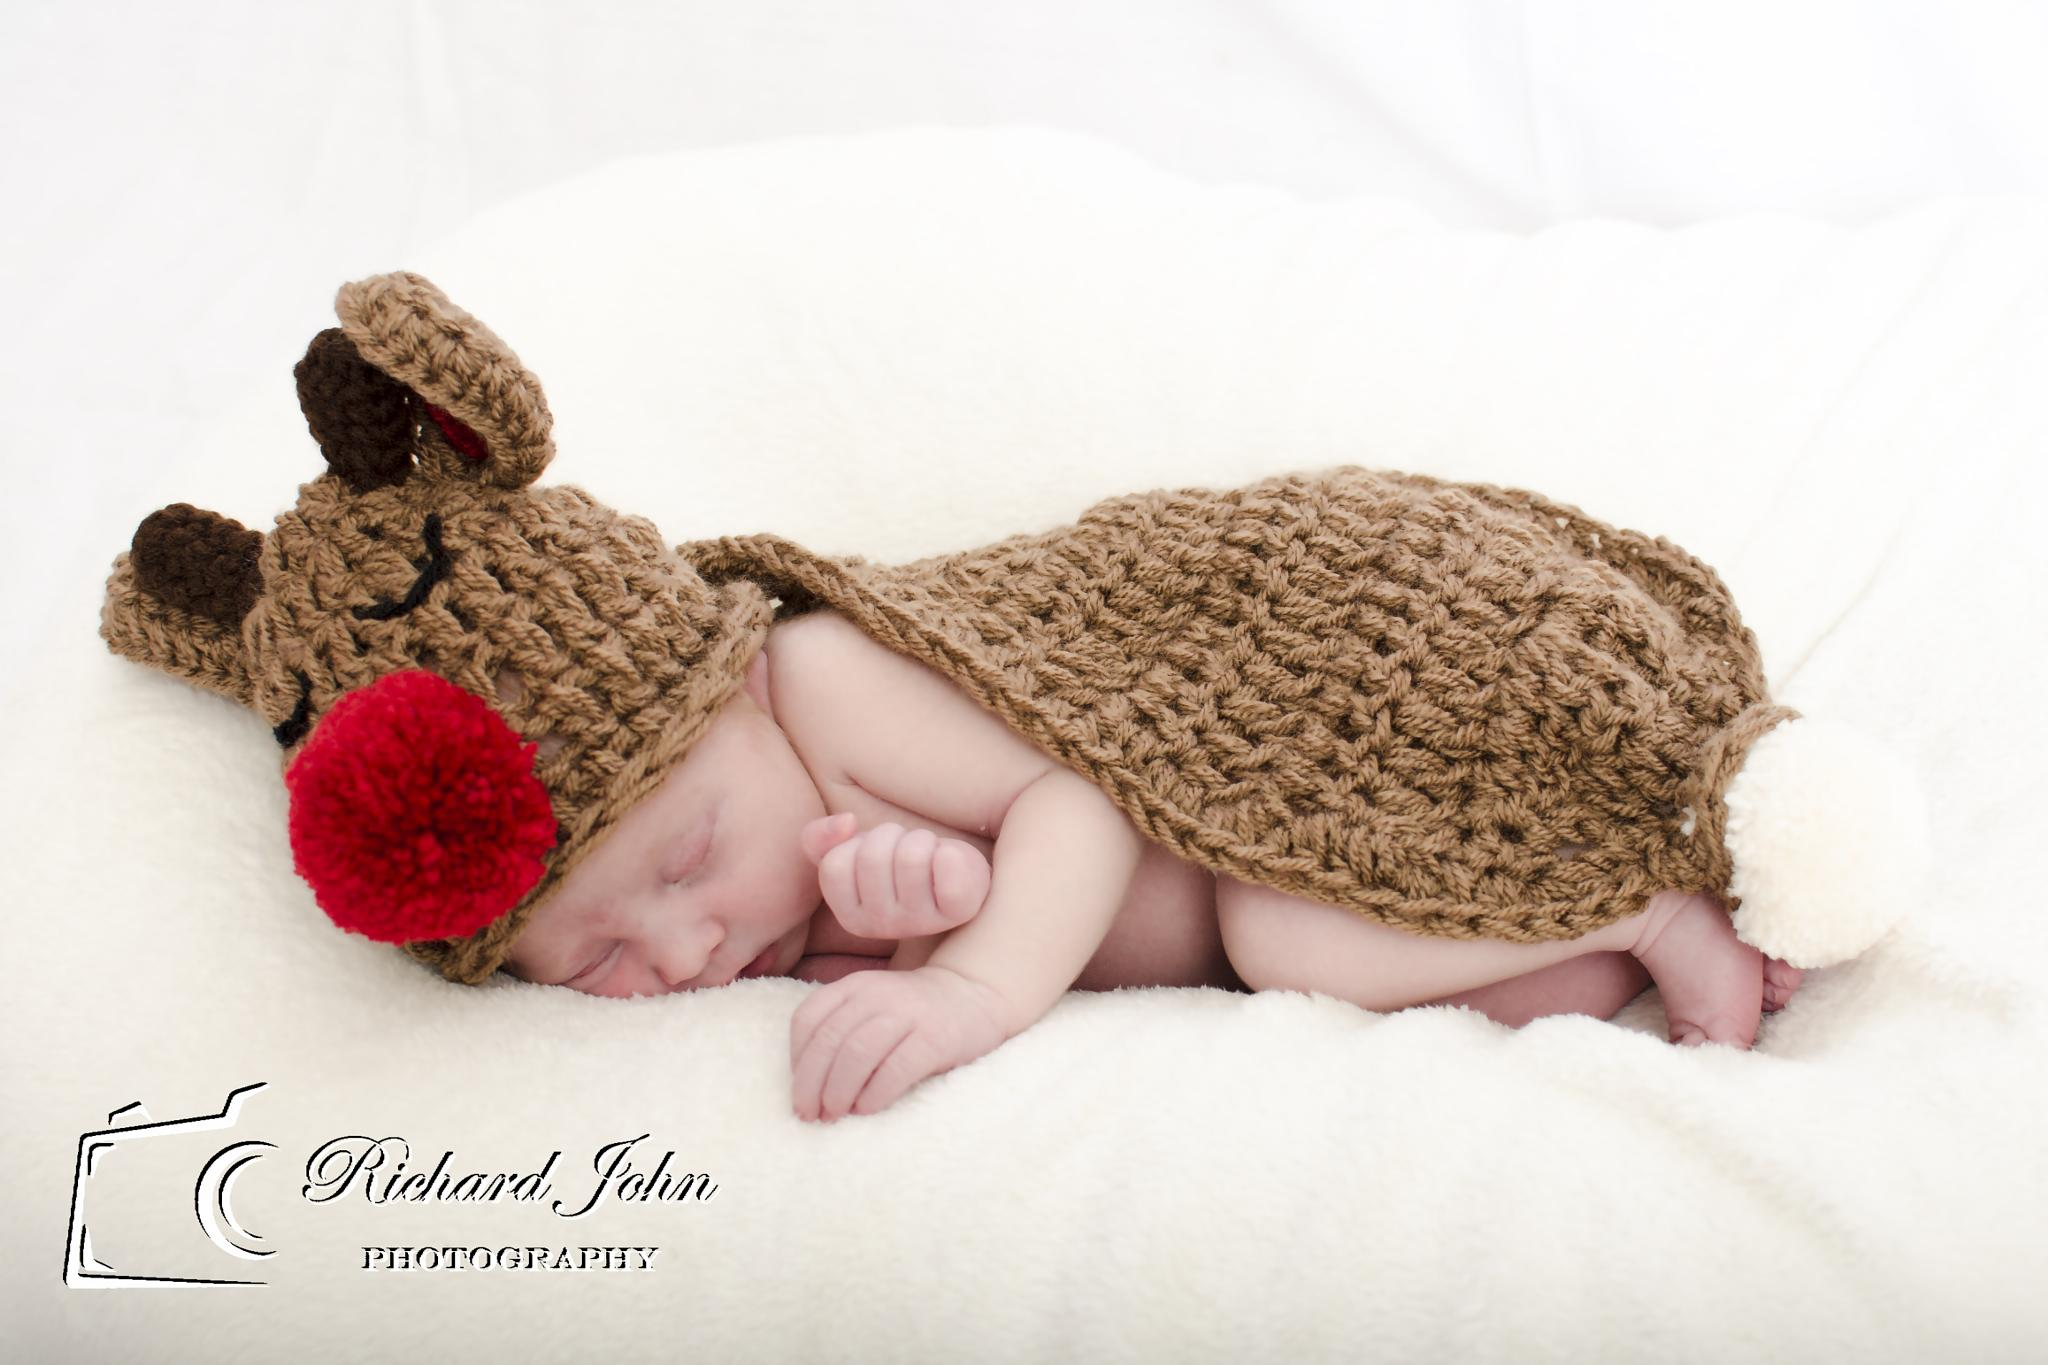 Rudolf baby by RichardJohnPhotography